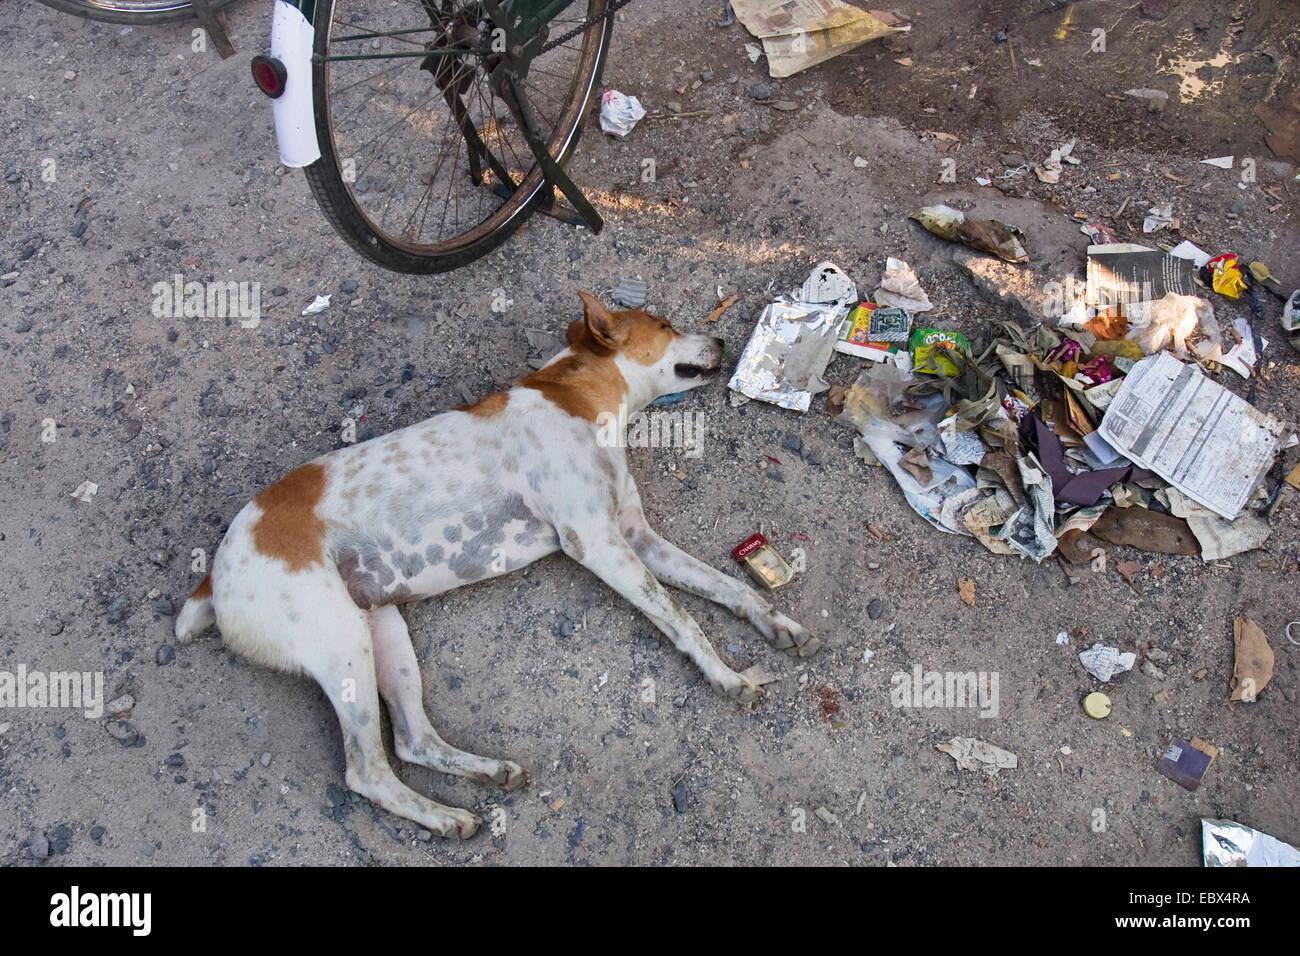 dog sleeping in the street beside garbage, India, Andaman Islands - Stock Image